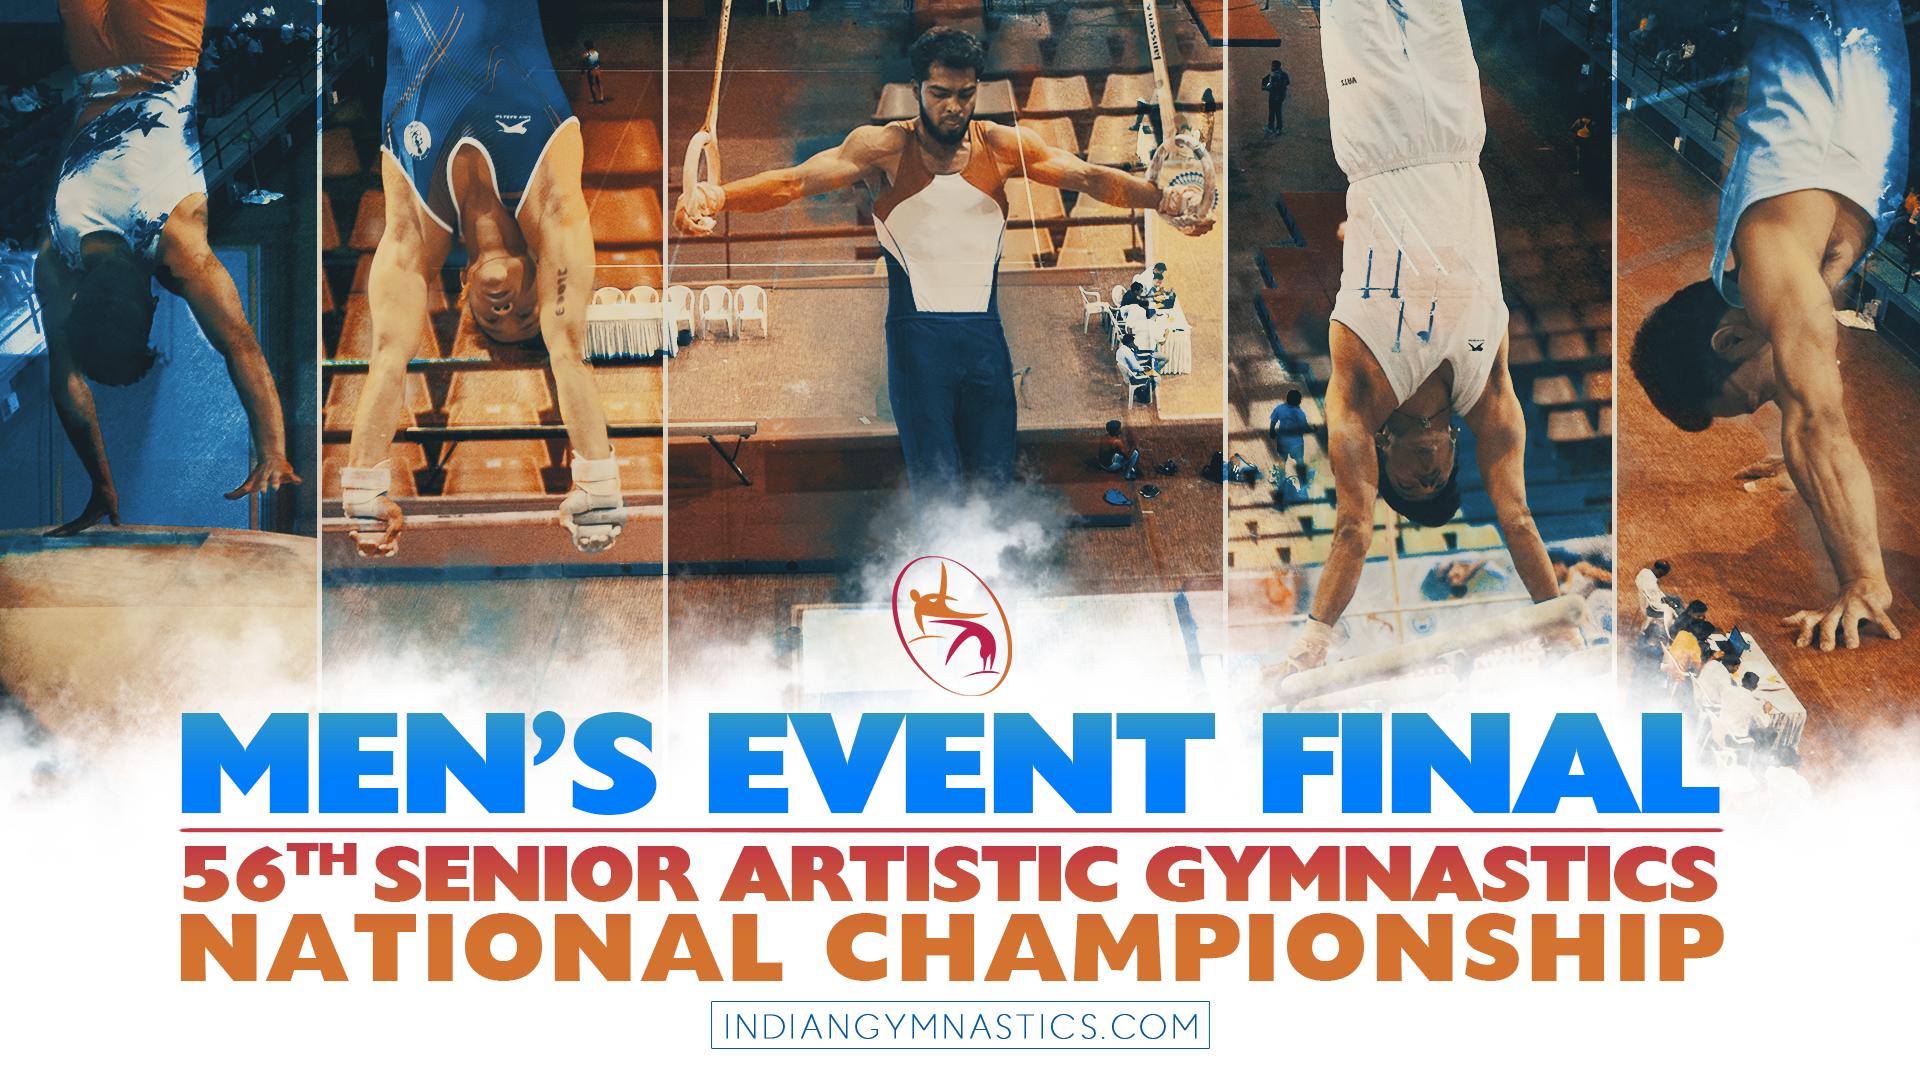 Men's Event Final | 56th Artistic Gymnastics National Championship Surat 2018